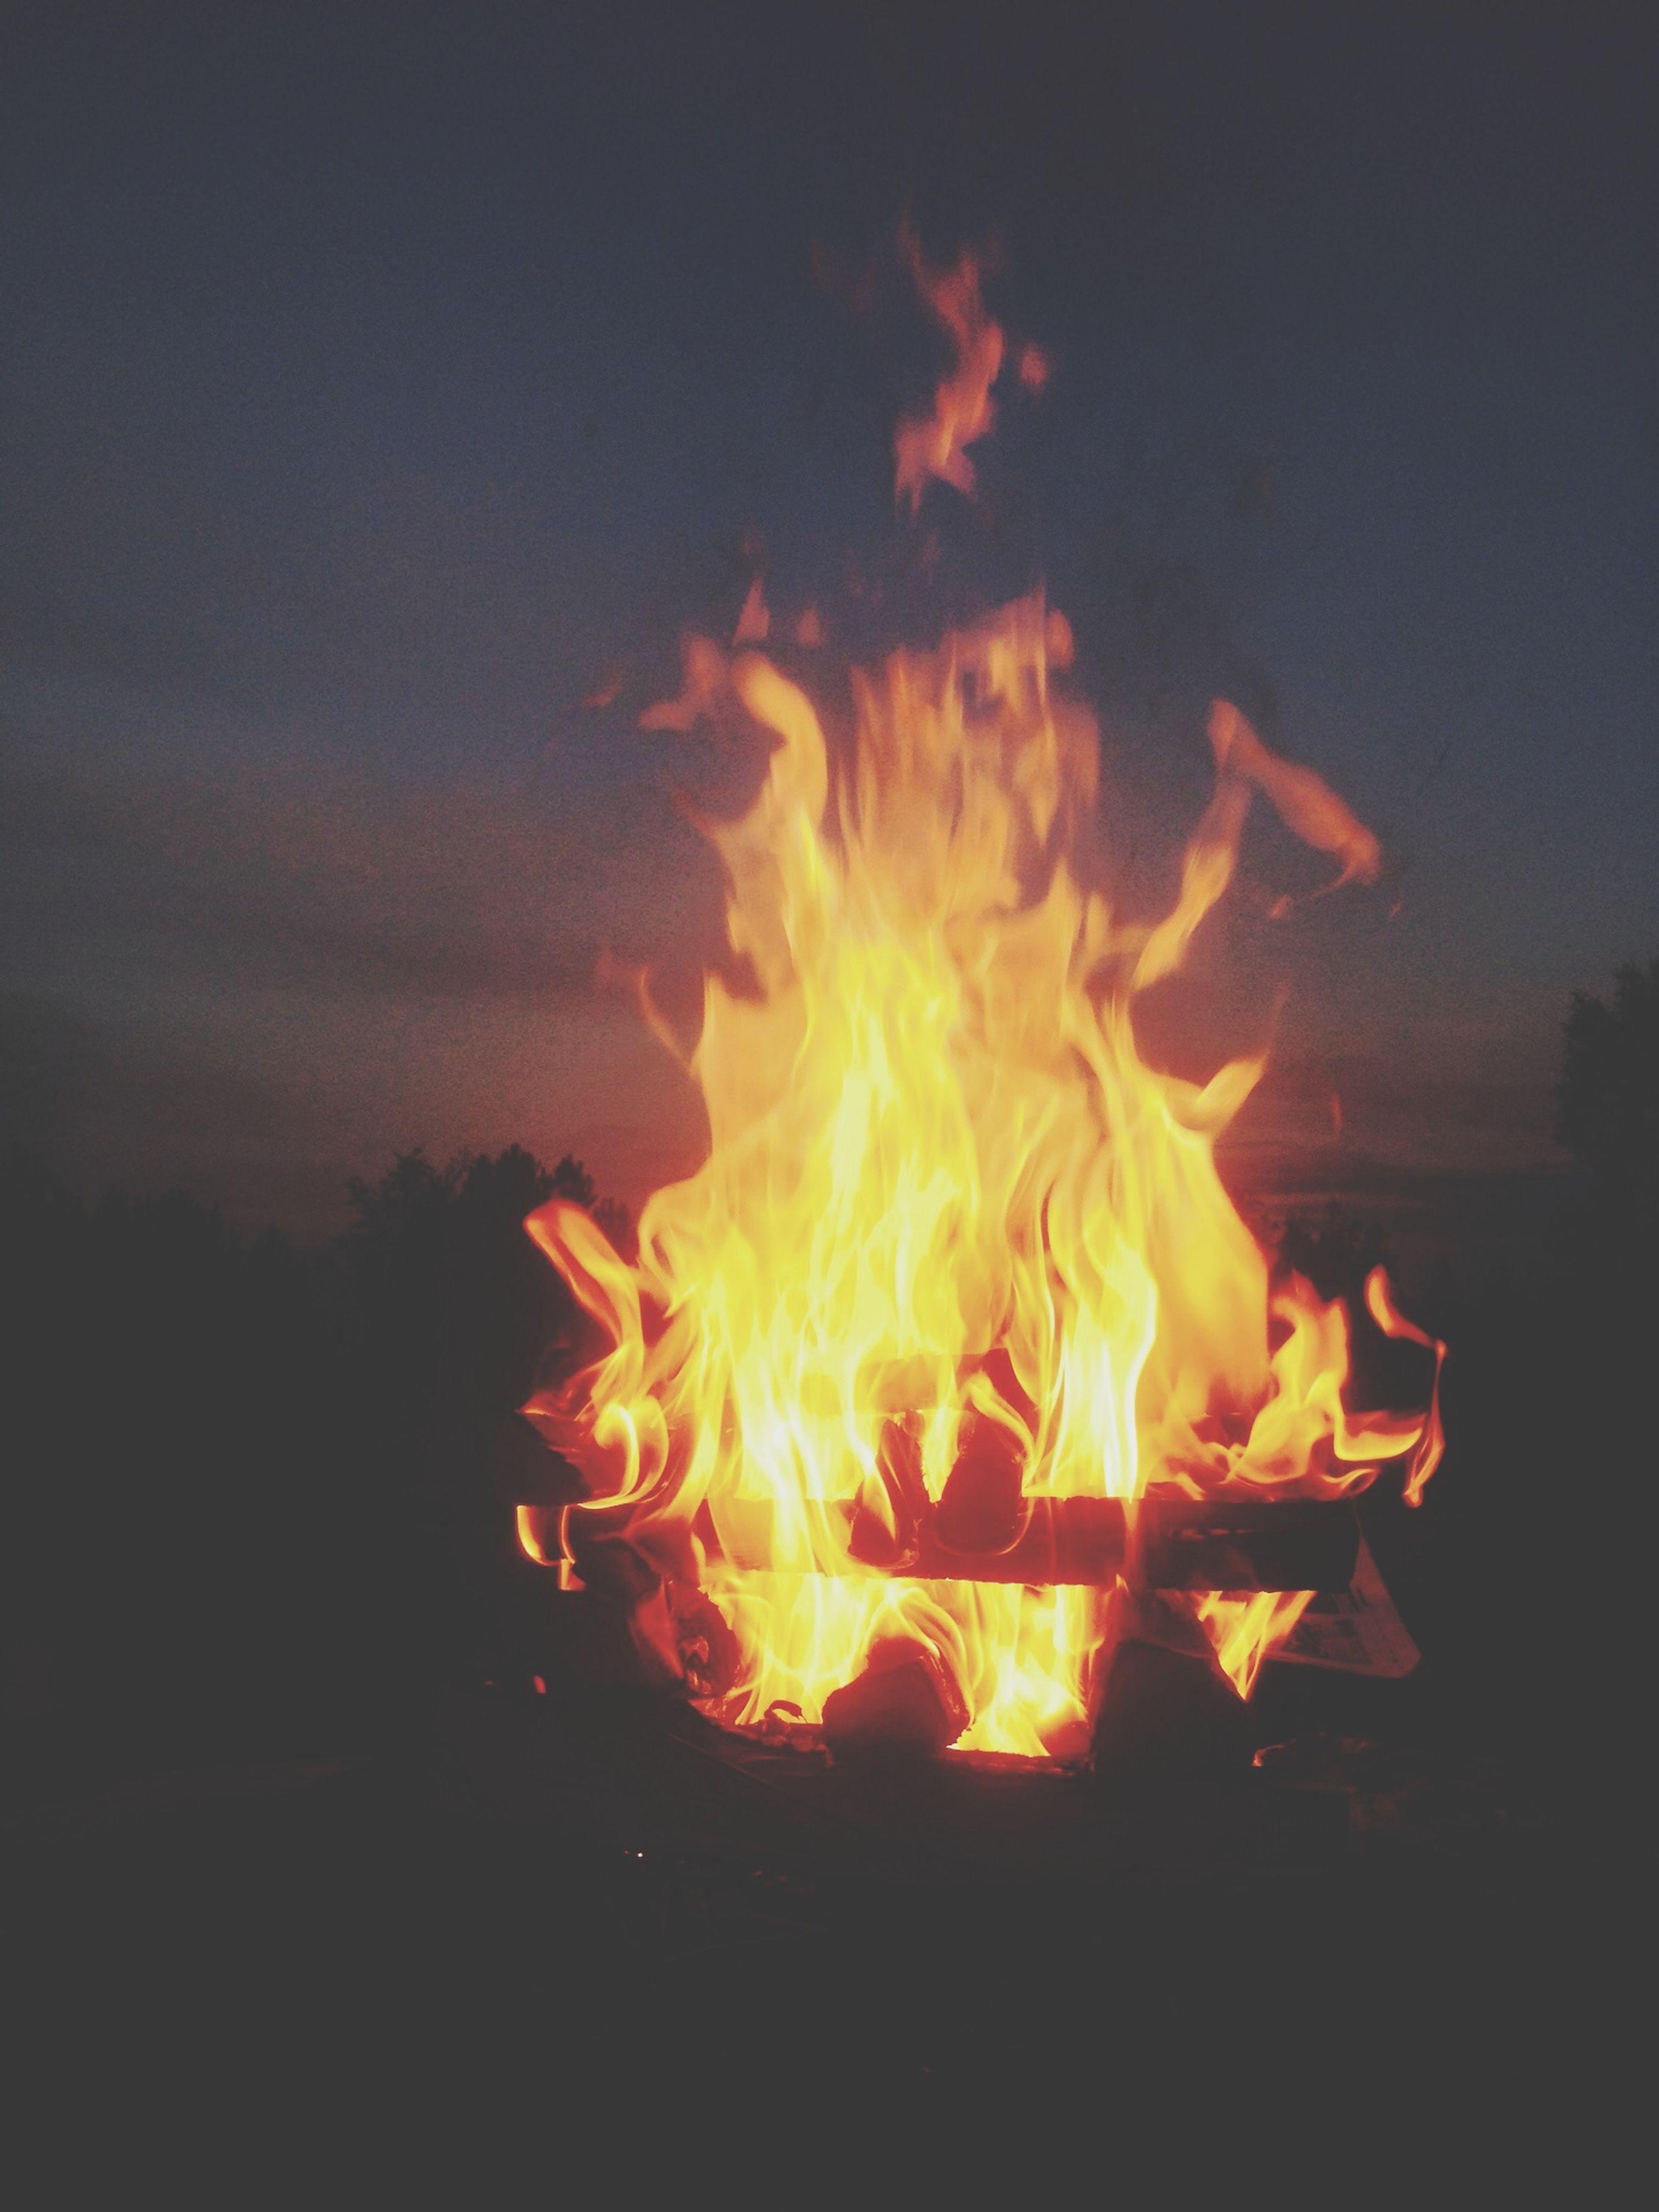 flame, burning, fire - natural phenomenon, heat - temperature, bonfire, glowing, fire, night, firewood, campfire, heat, orange color, motion, illuminated, close-up, dark, long exposure, outdoors, smoke - physical structure, light - natural phenomenon